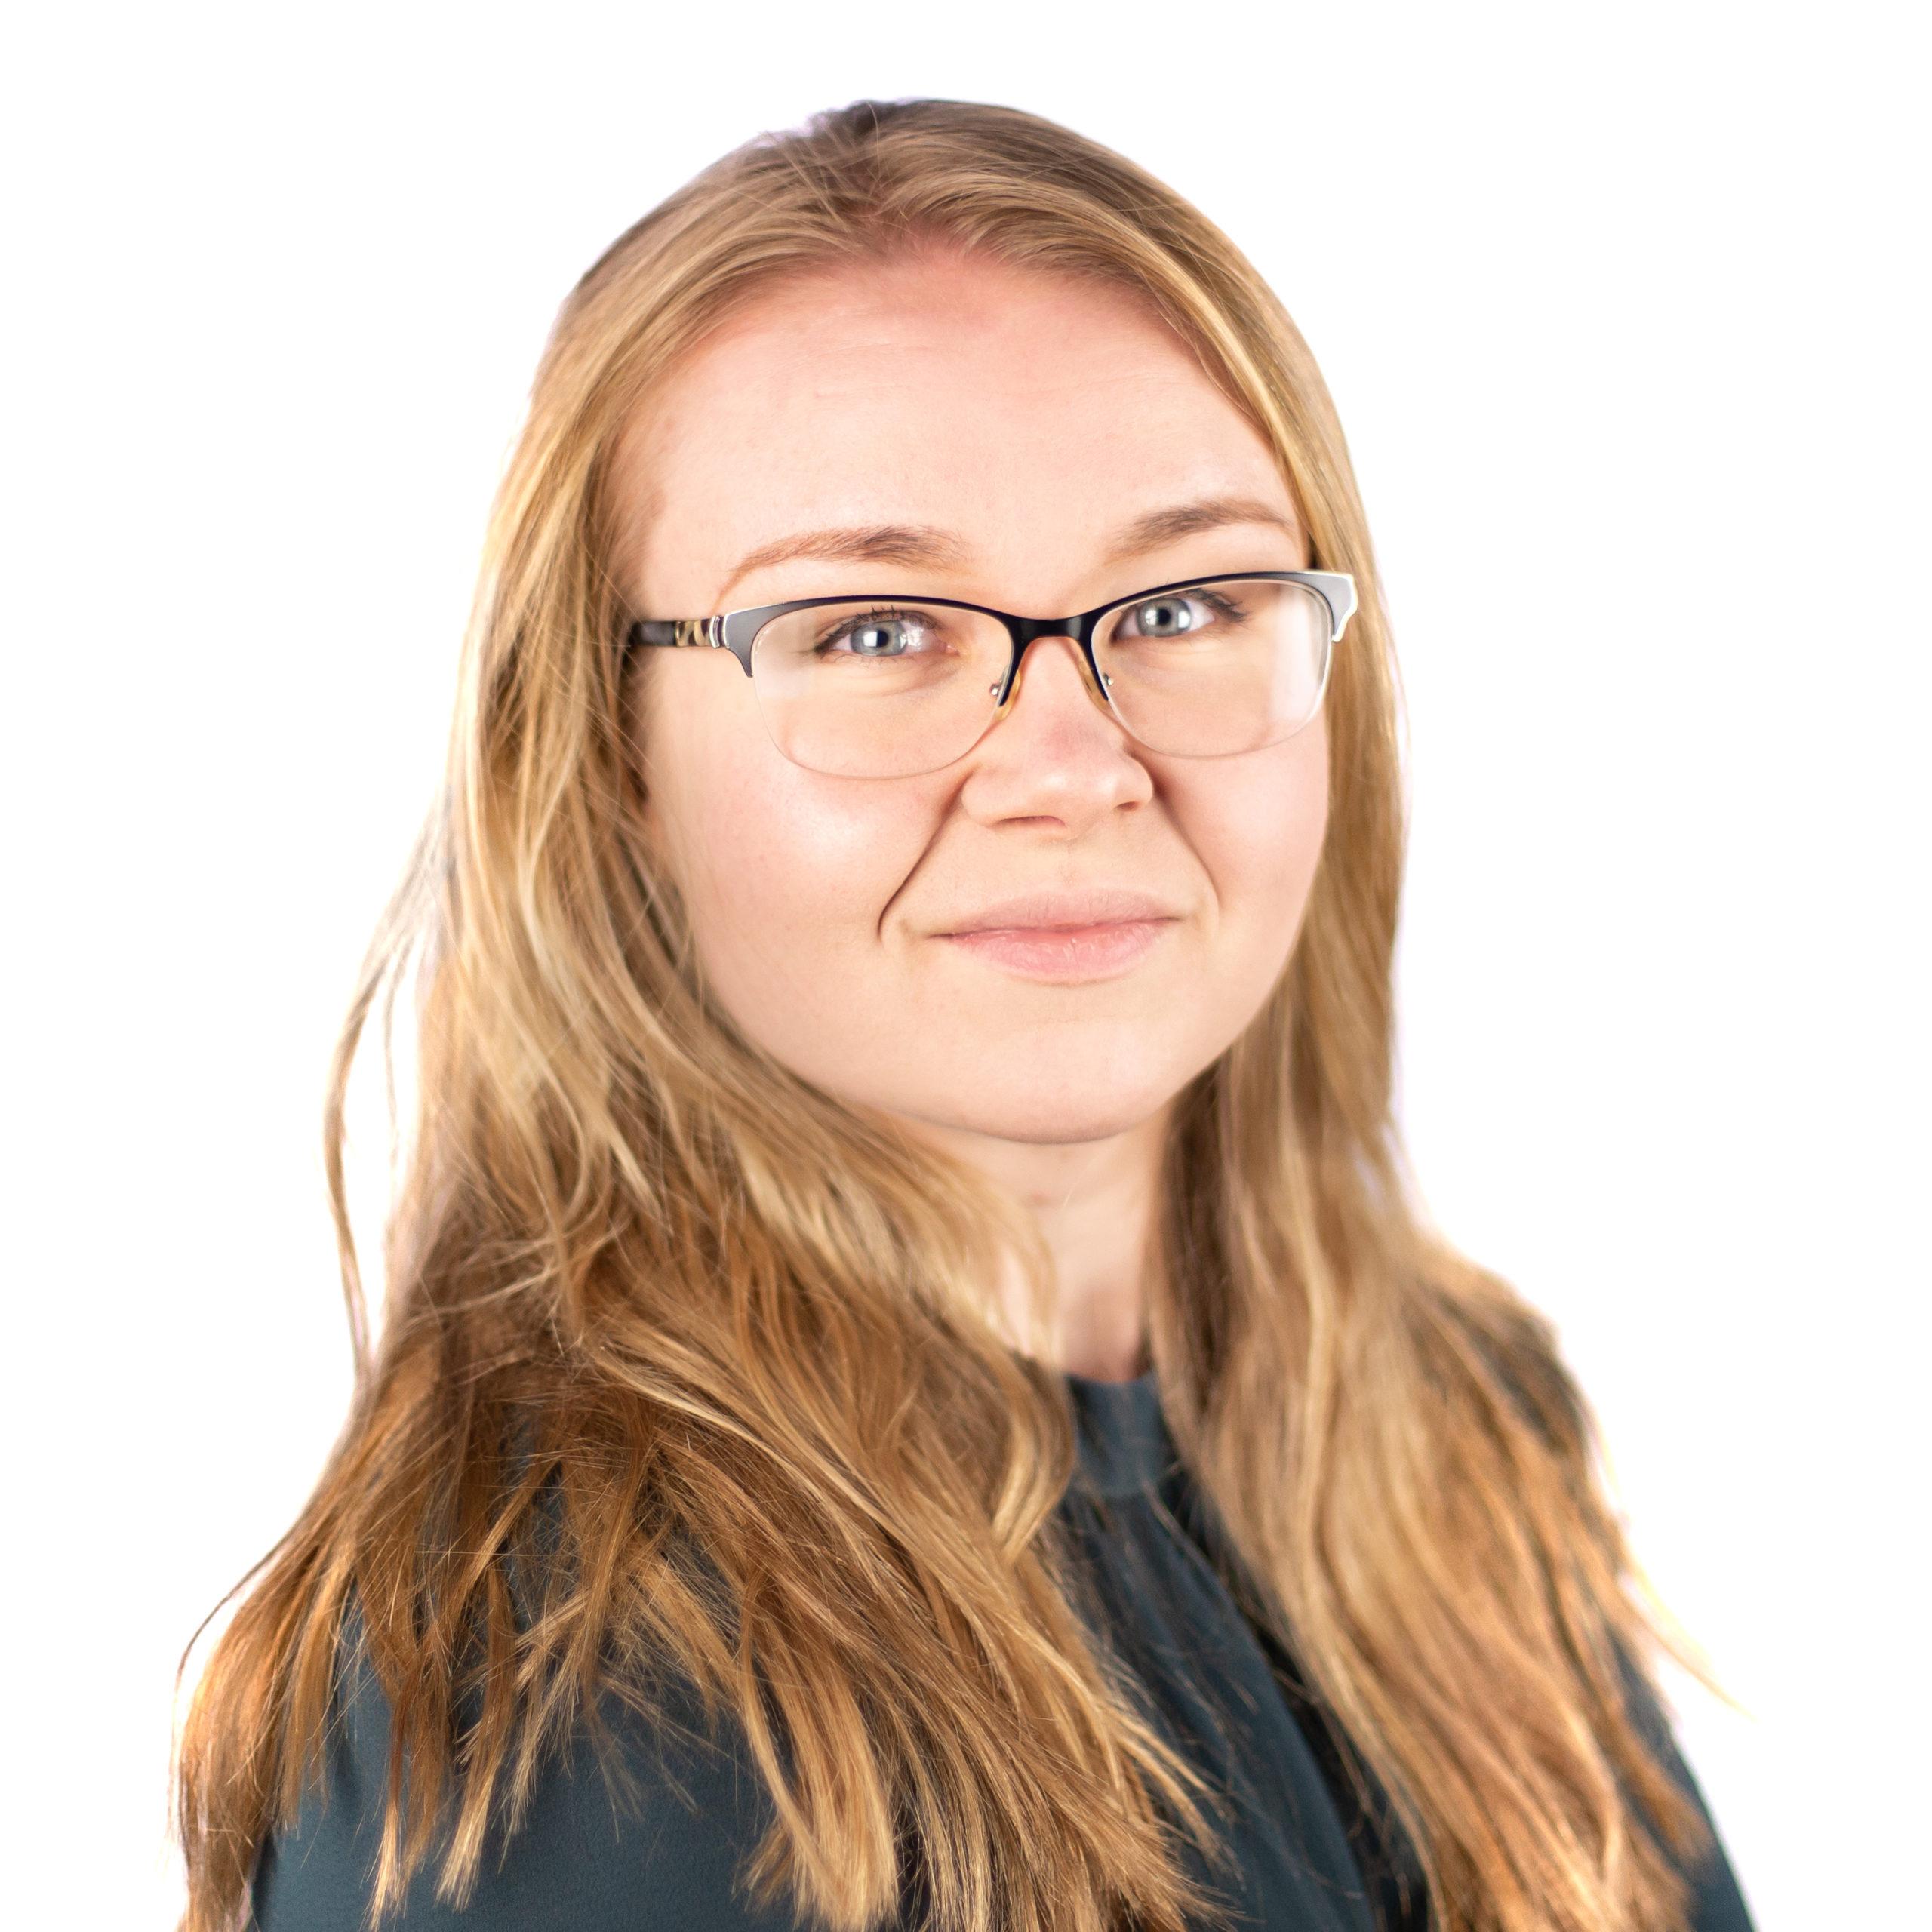 Anni Business Tampere Laura Vanzo 1